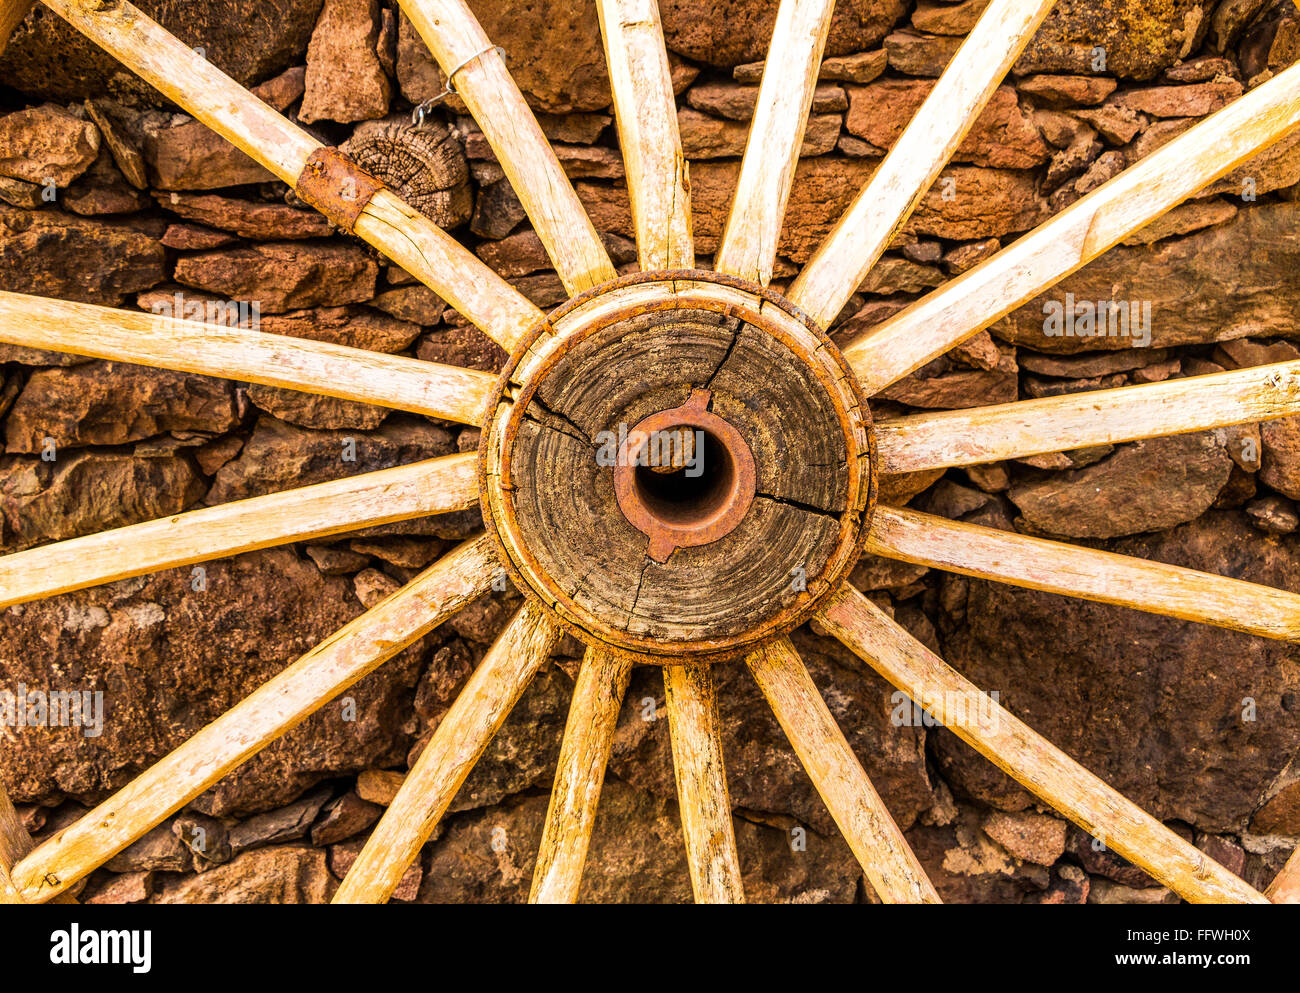 Old wooden cartwheel, El Hoyo, Gran Canaria, Canary Islands, Spain, Europe - Stock Image